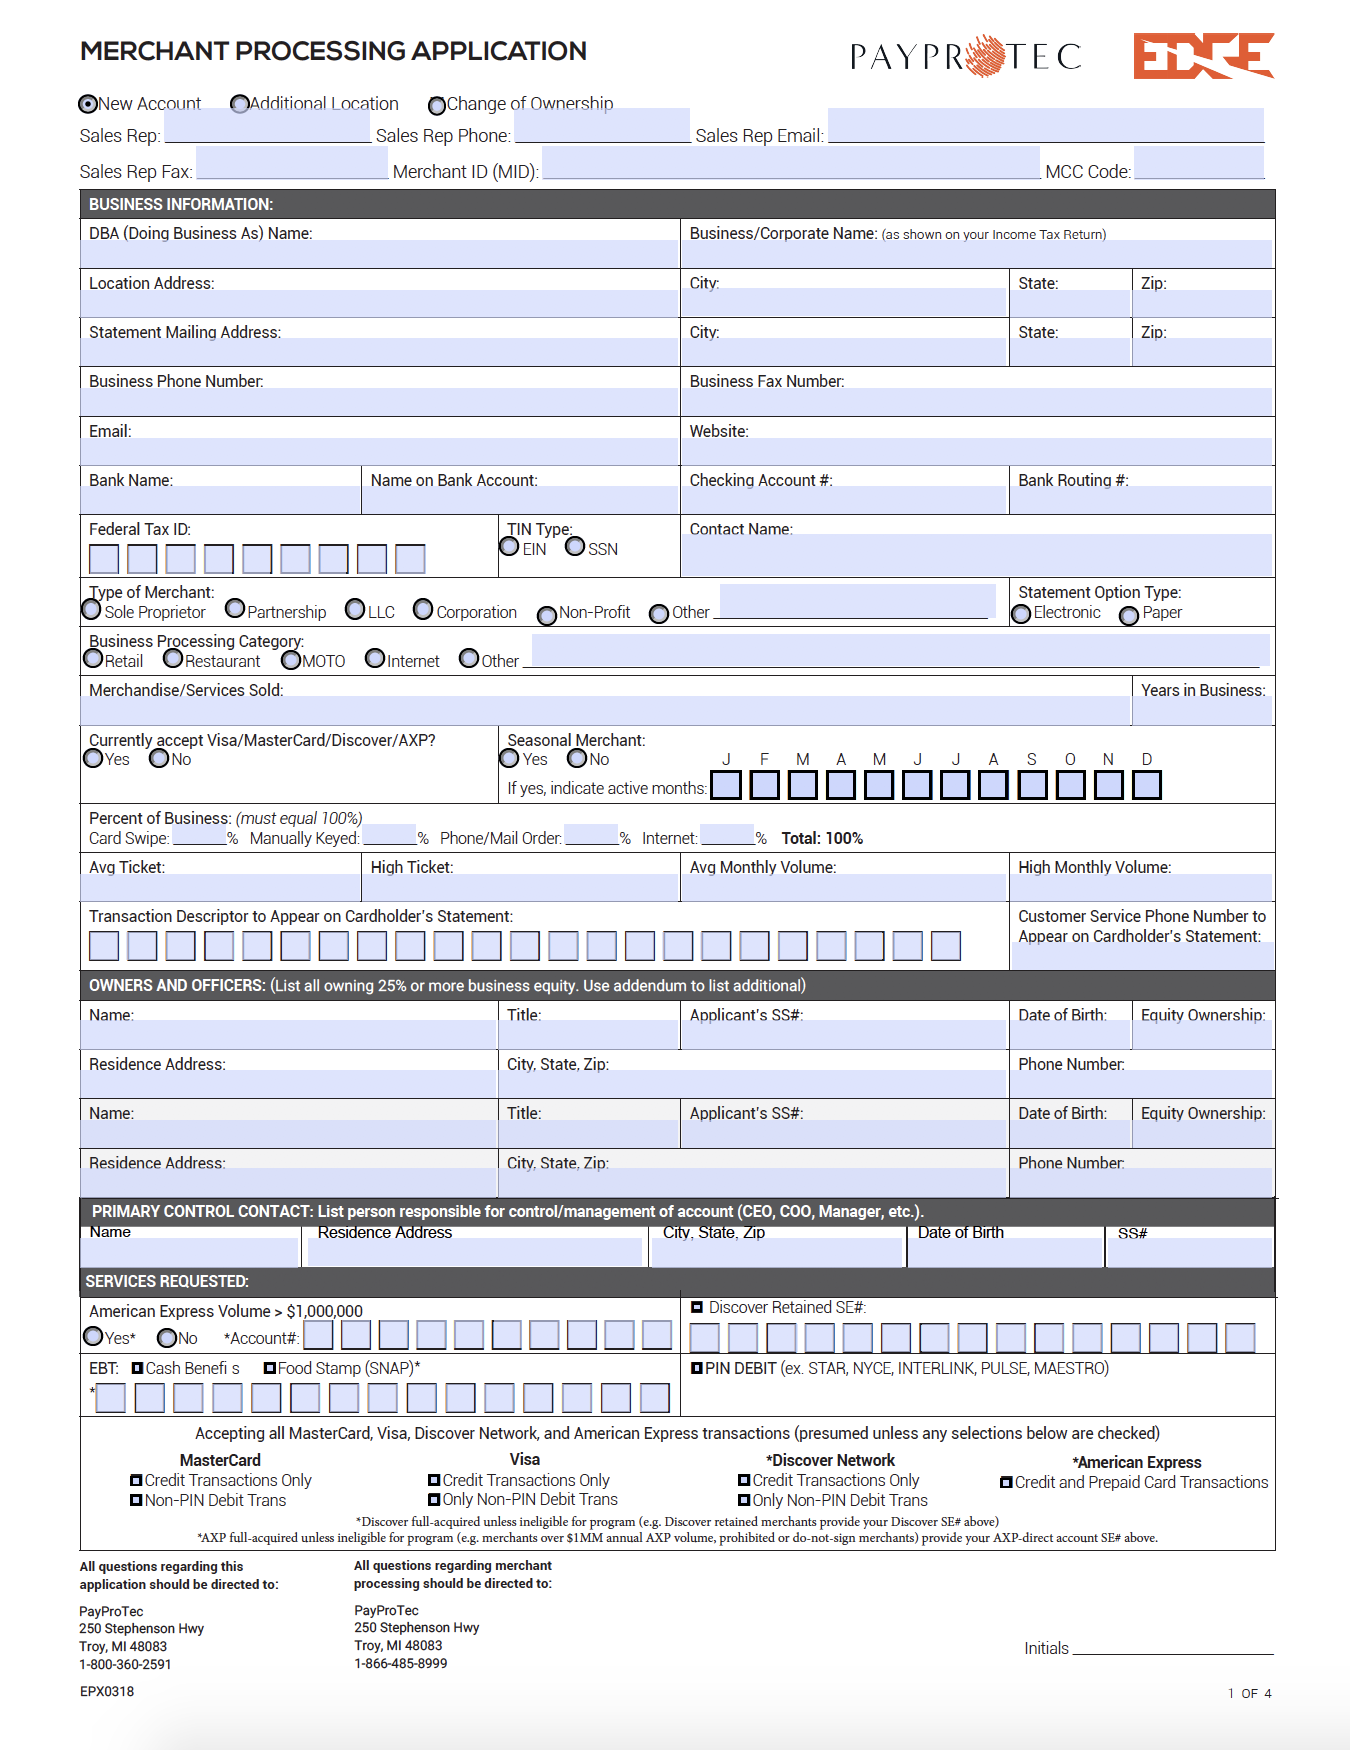 EPX TBB EDGE Application